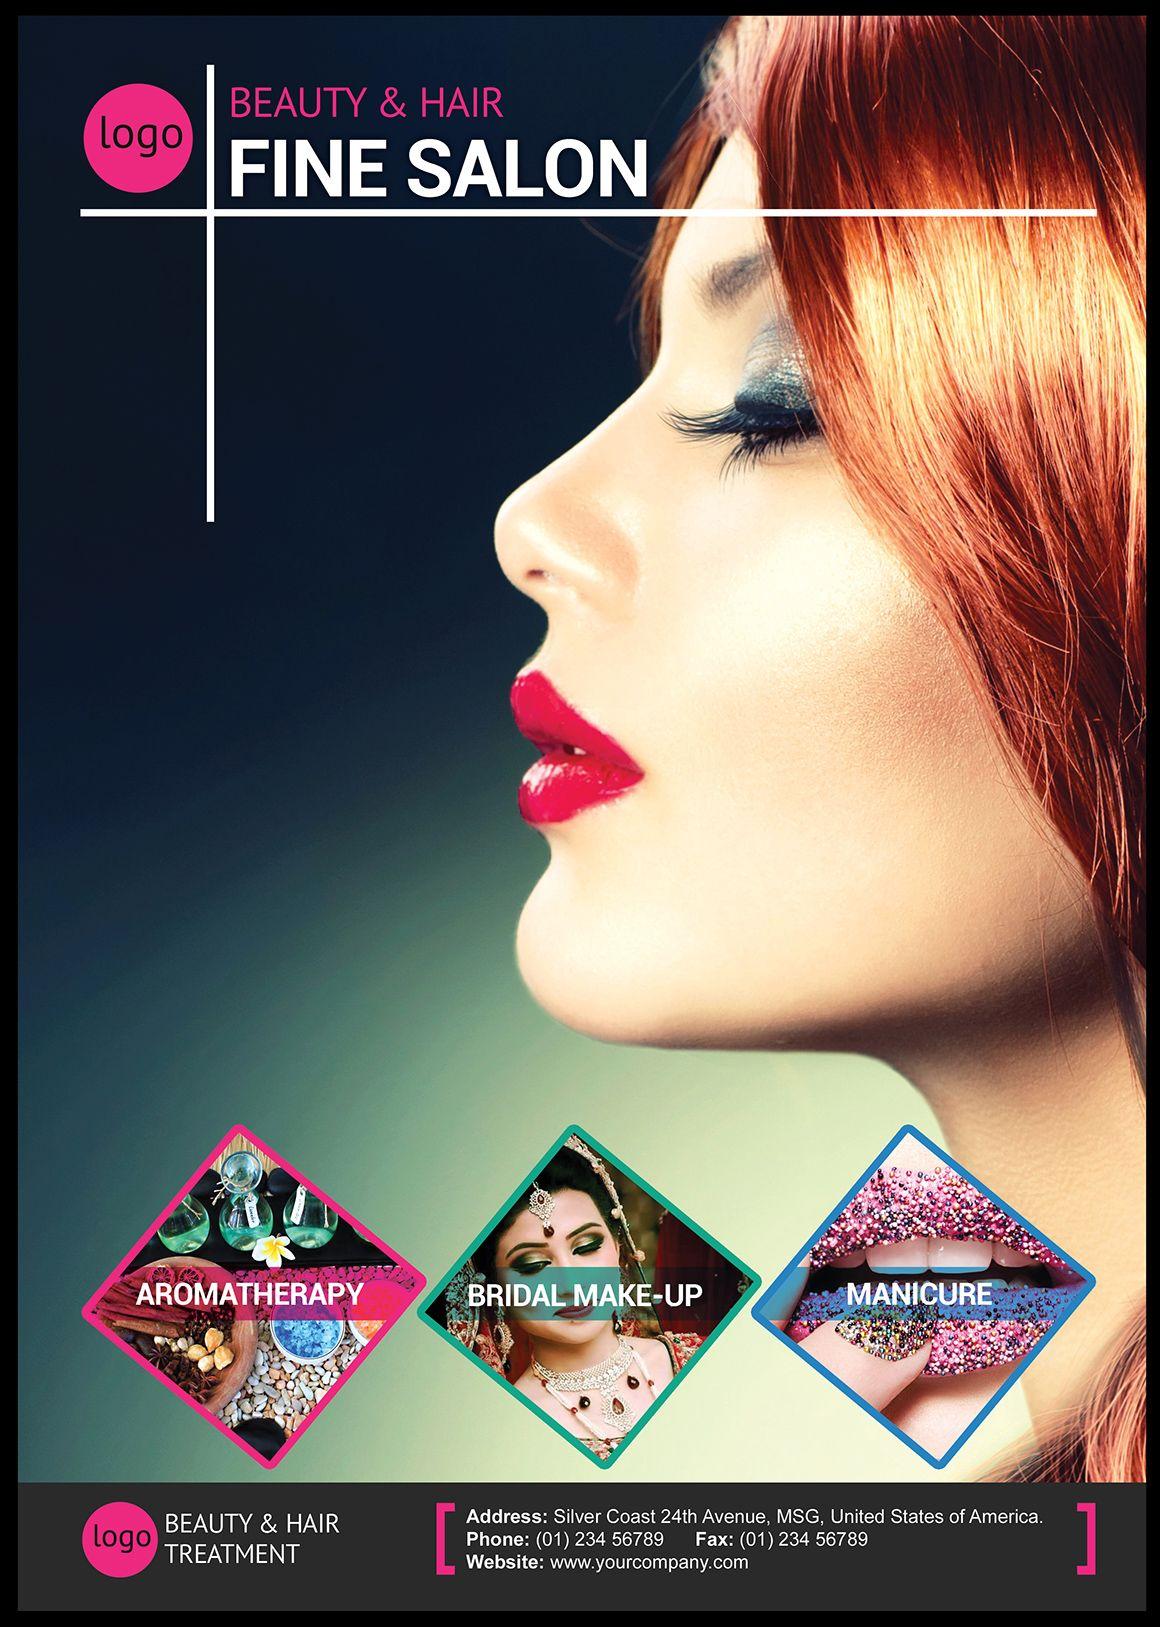 Beauty Parlor Banner Design: The beauty parlor studio ...